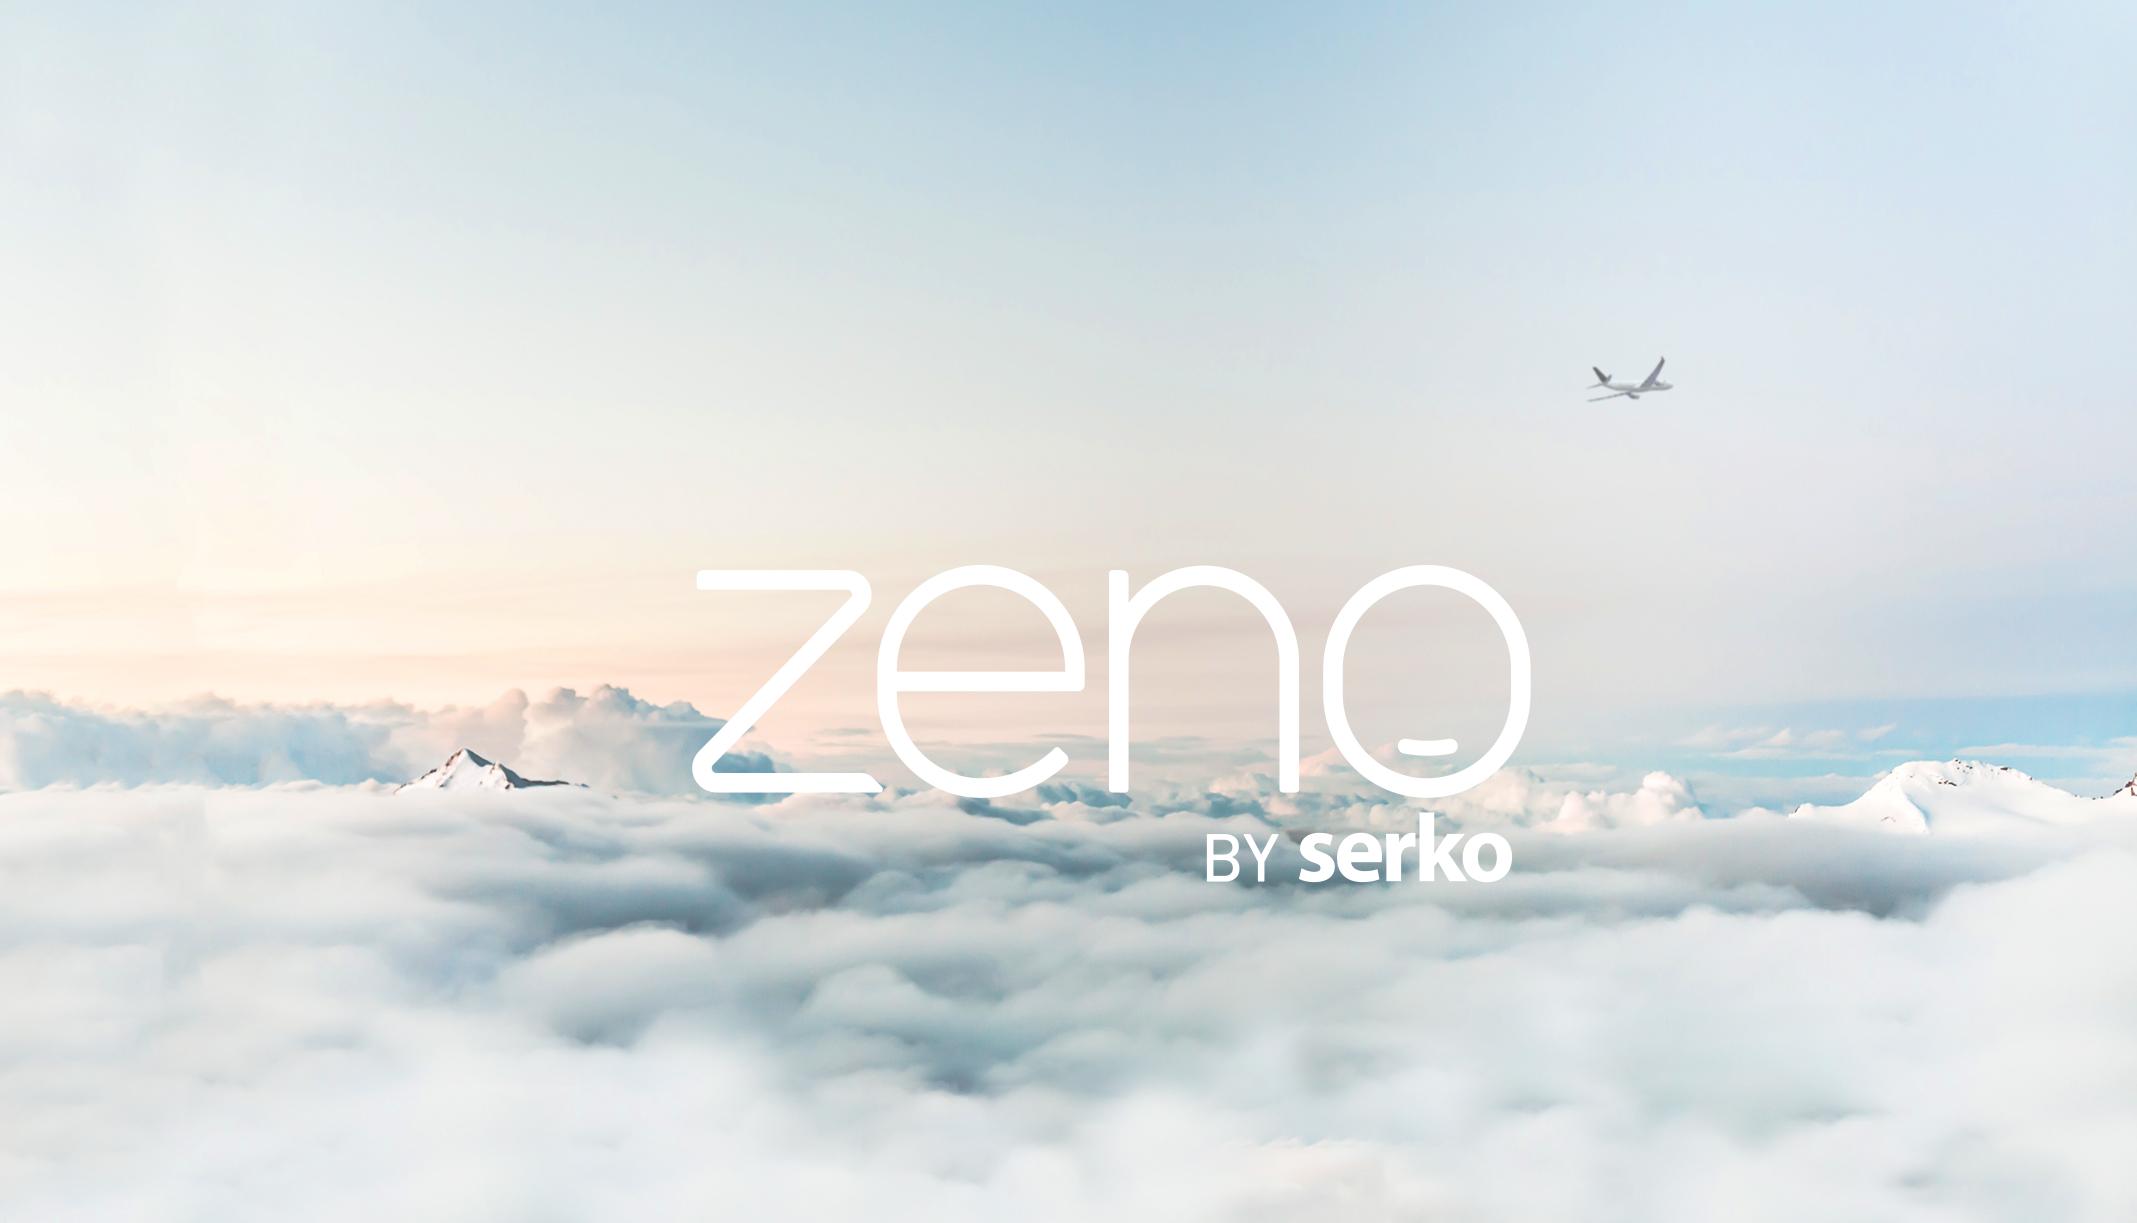 zeno by serko